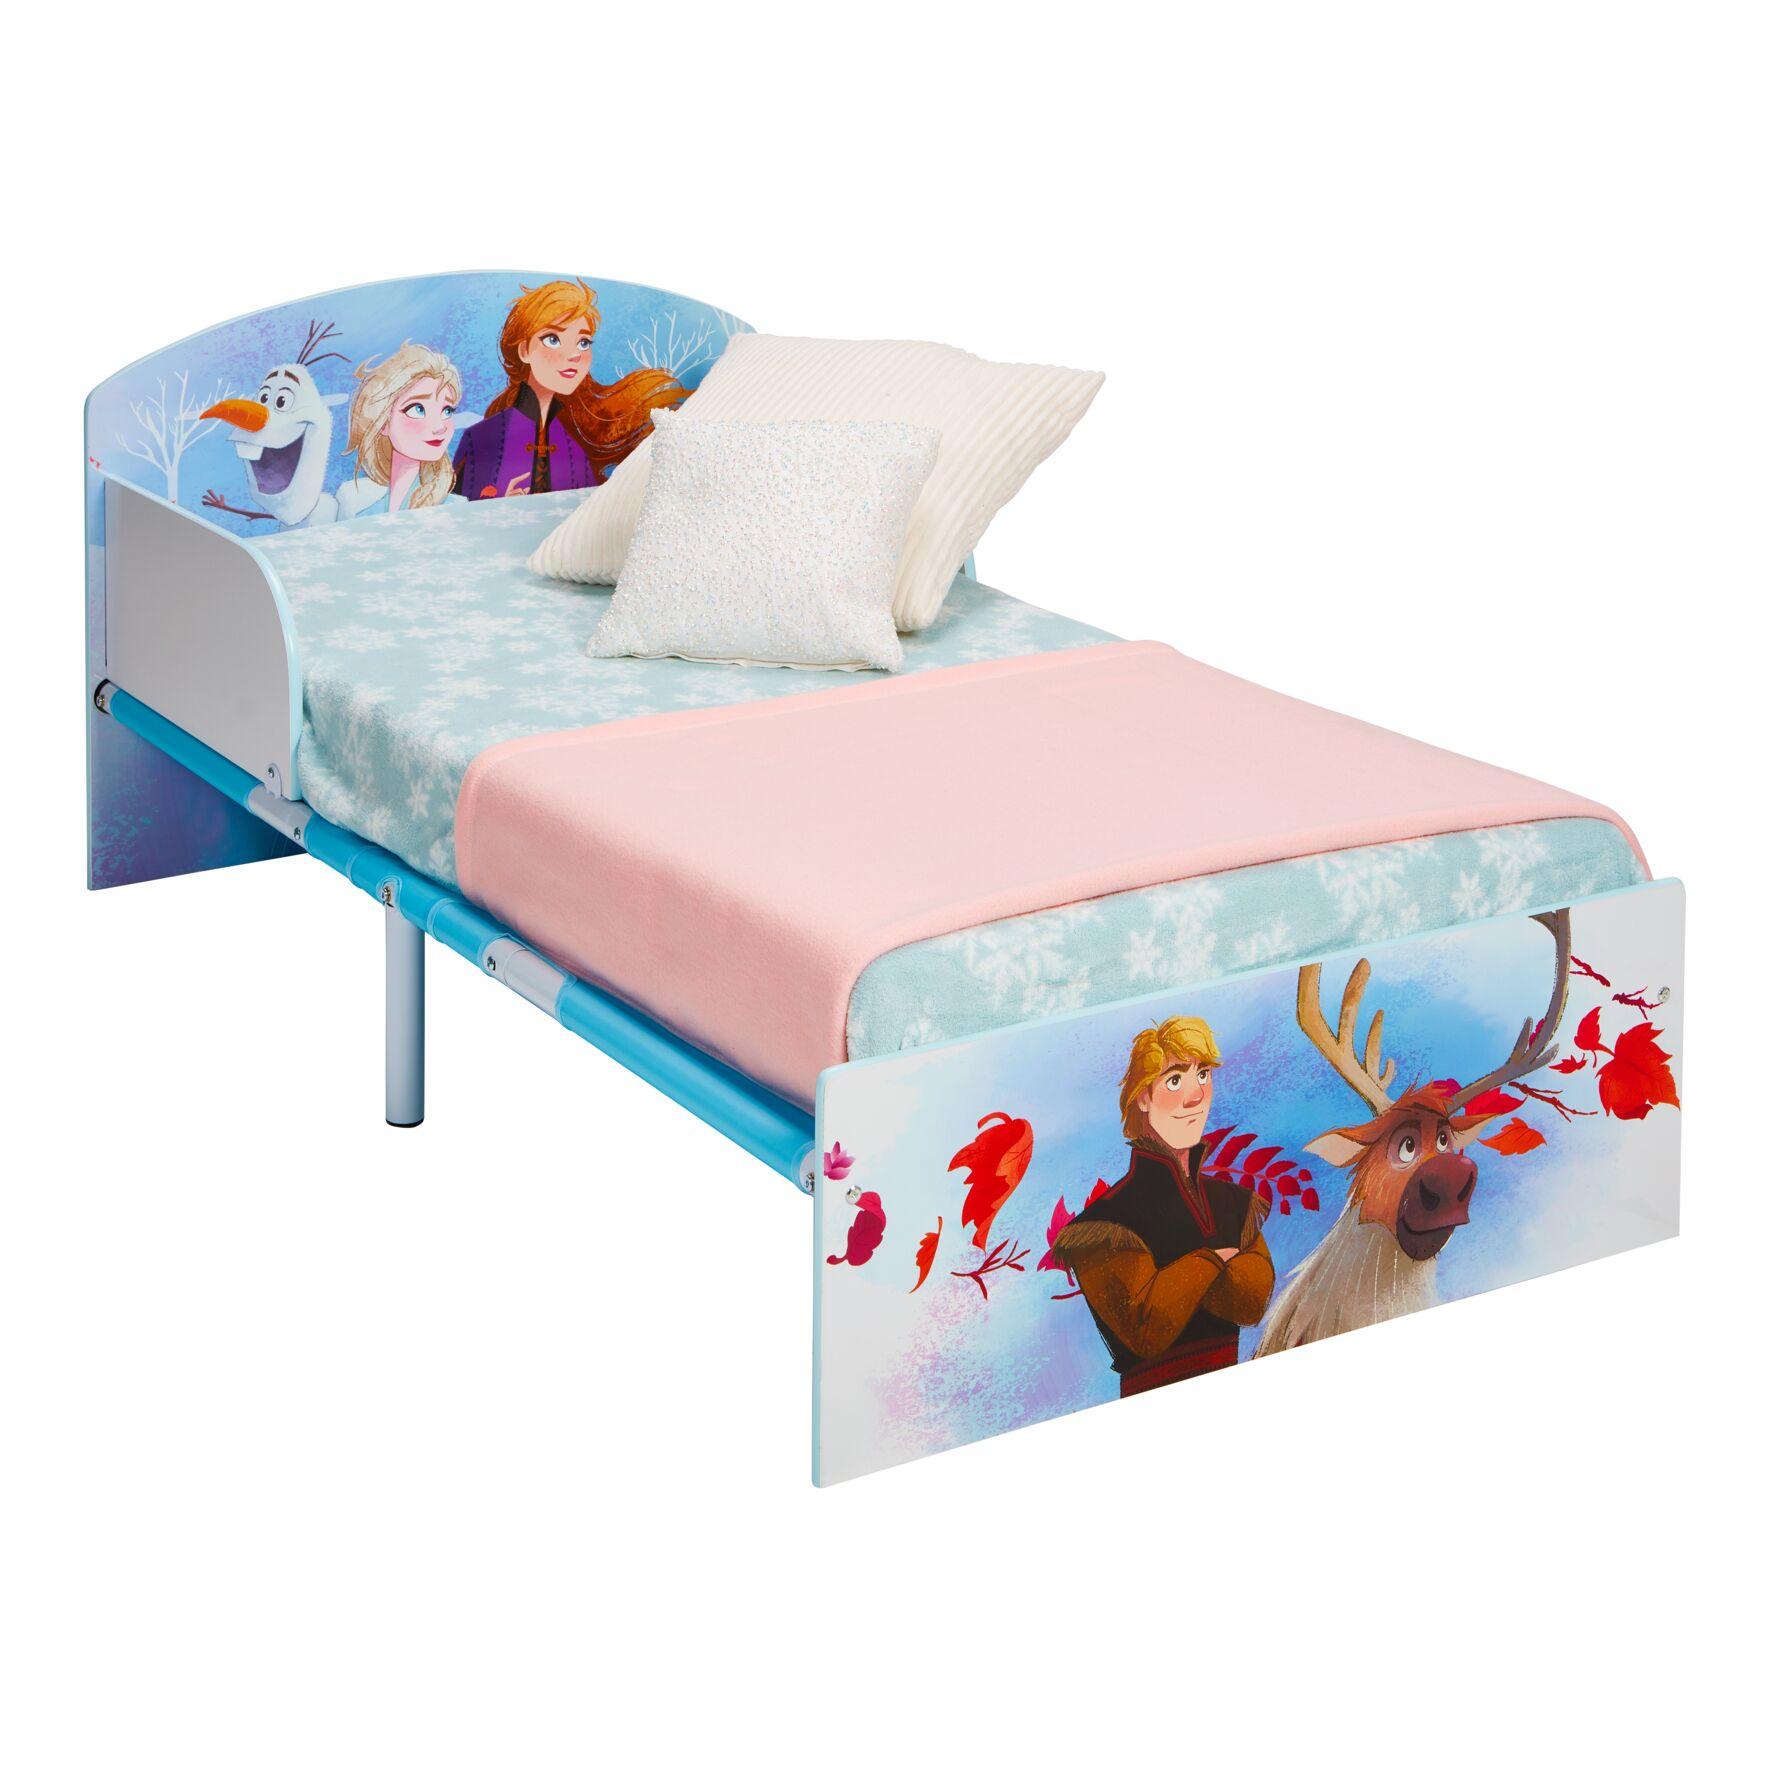 Disney Frozen - Kids Toddler Bed (505FZO01E)